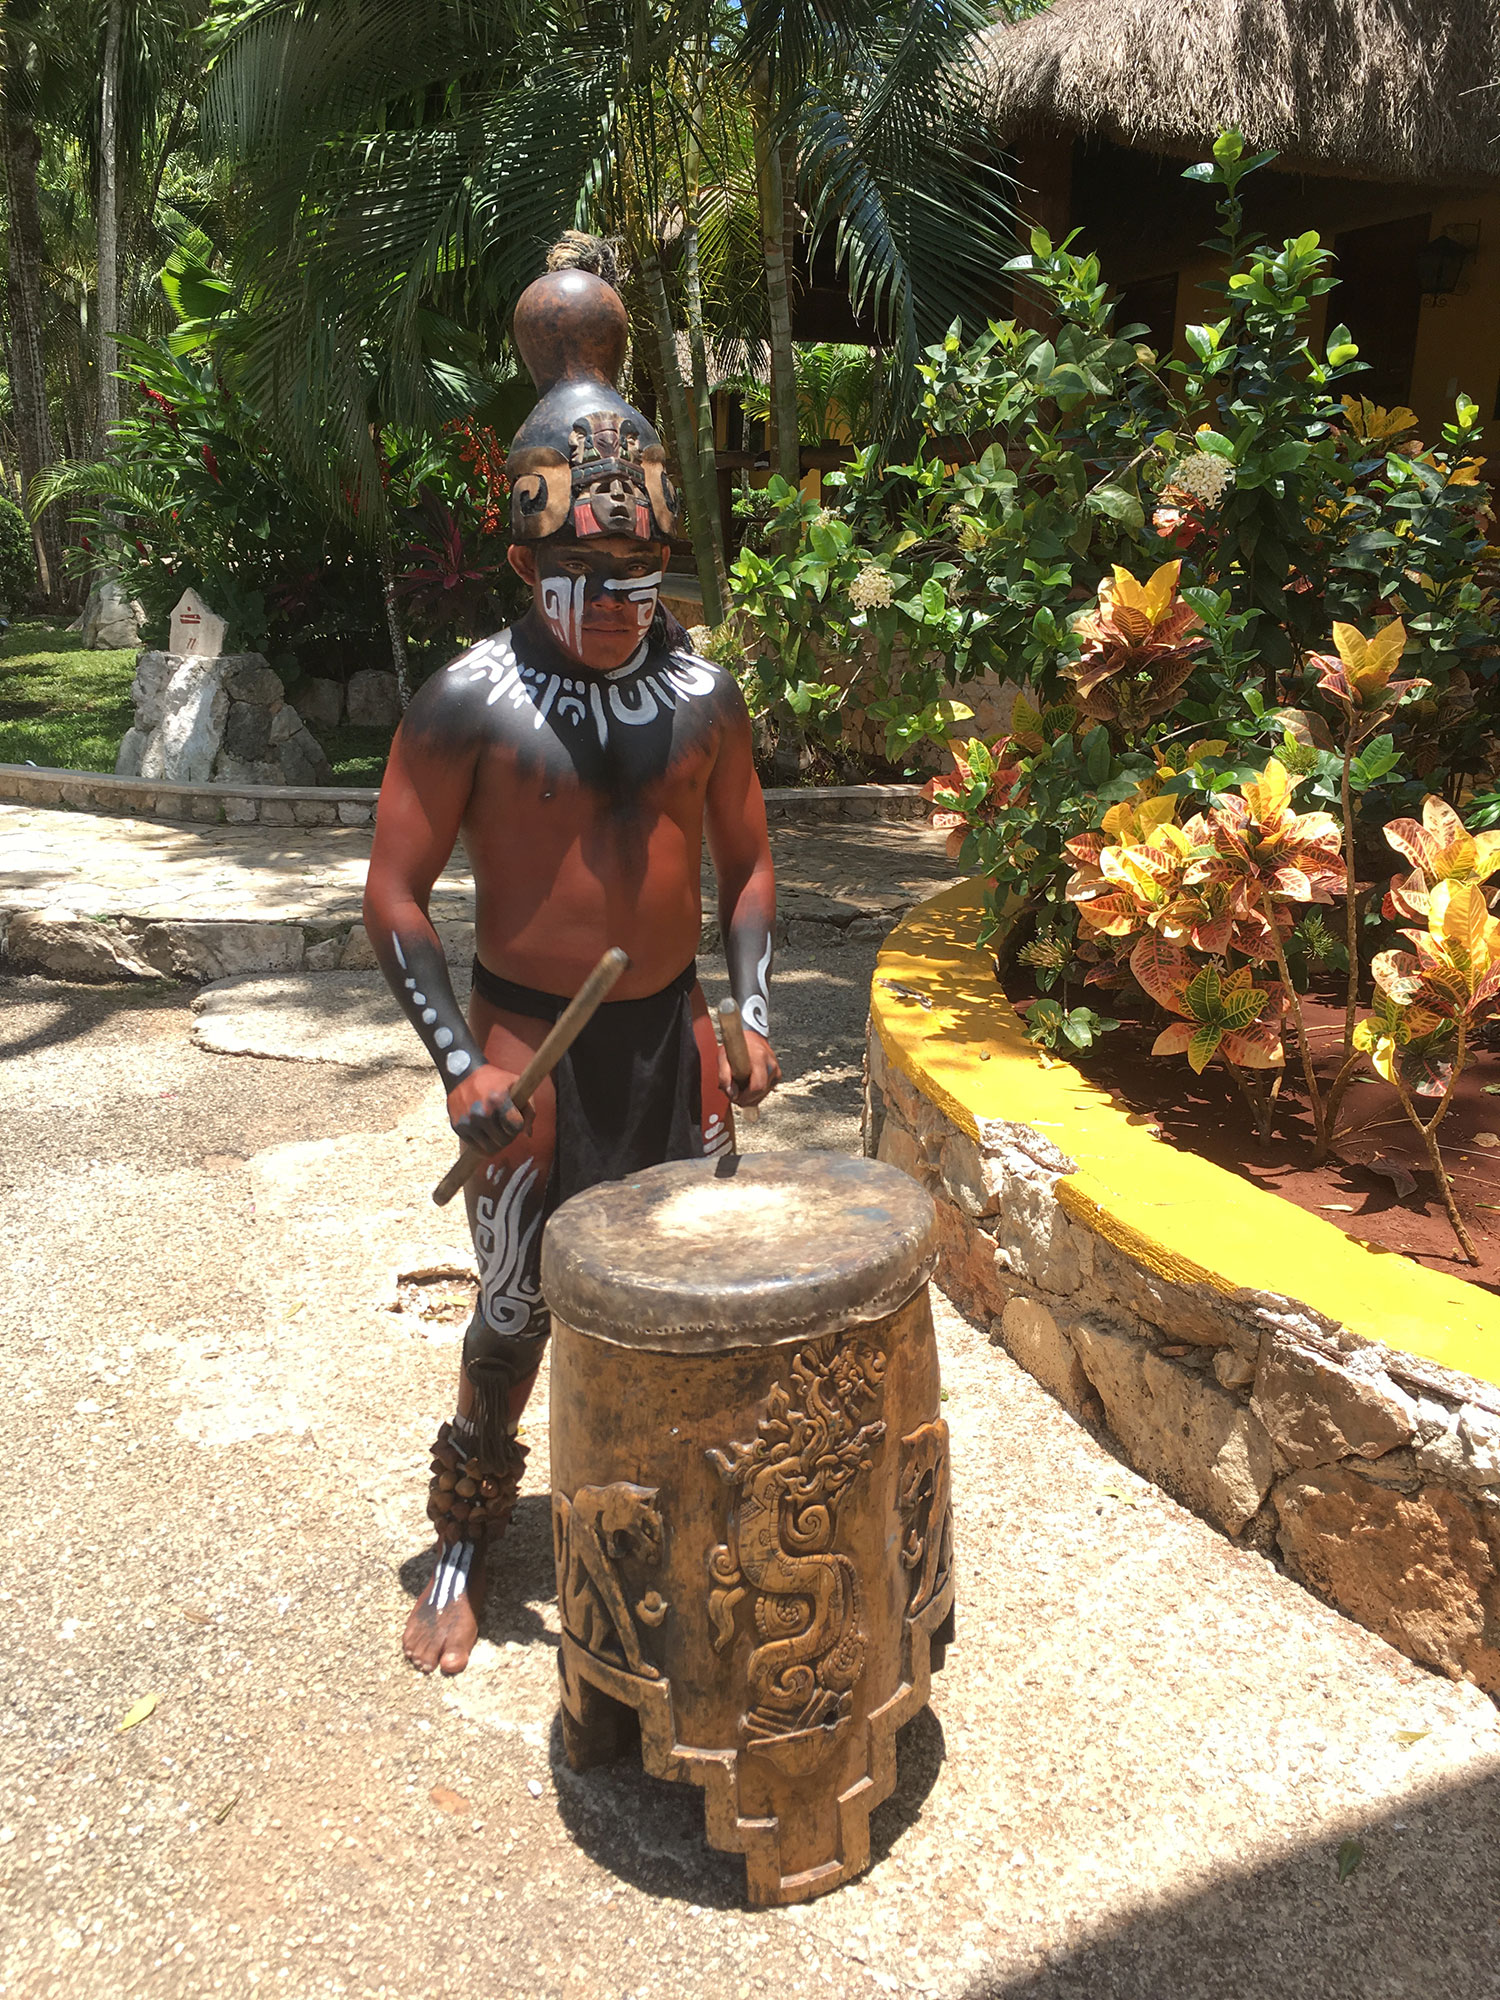 Hammocks_and_Ruins_What_to_Do_Mexico_Mayan_pyramid_cenote_Ik_Kil_14.jpg